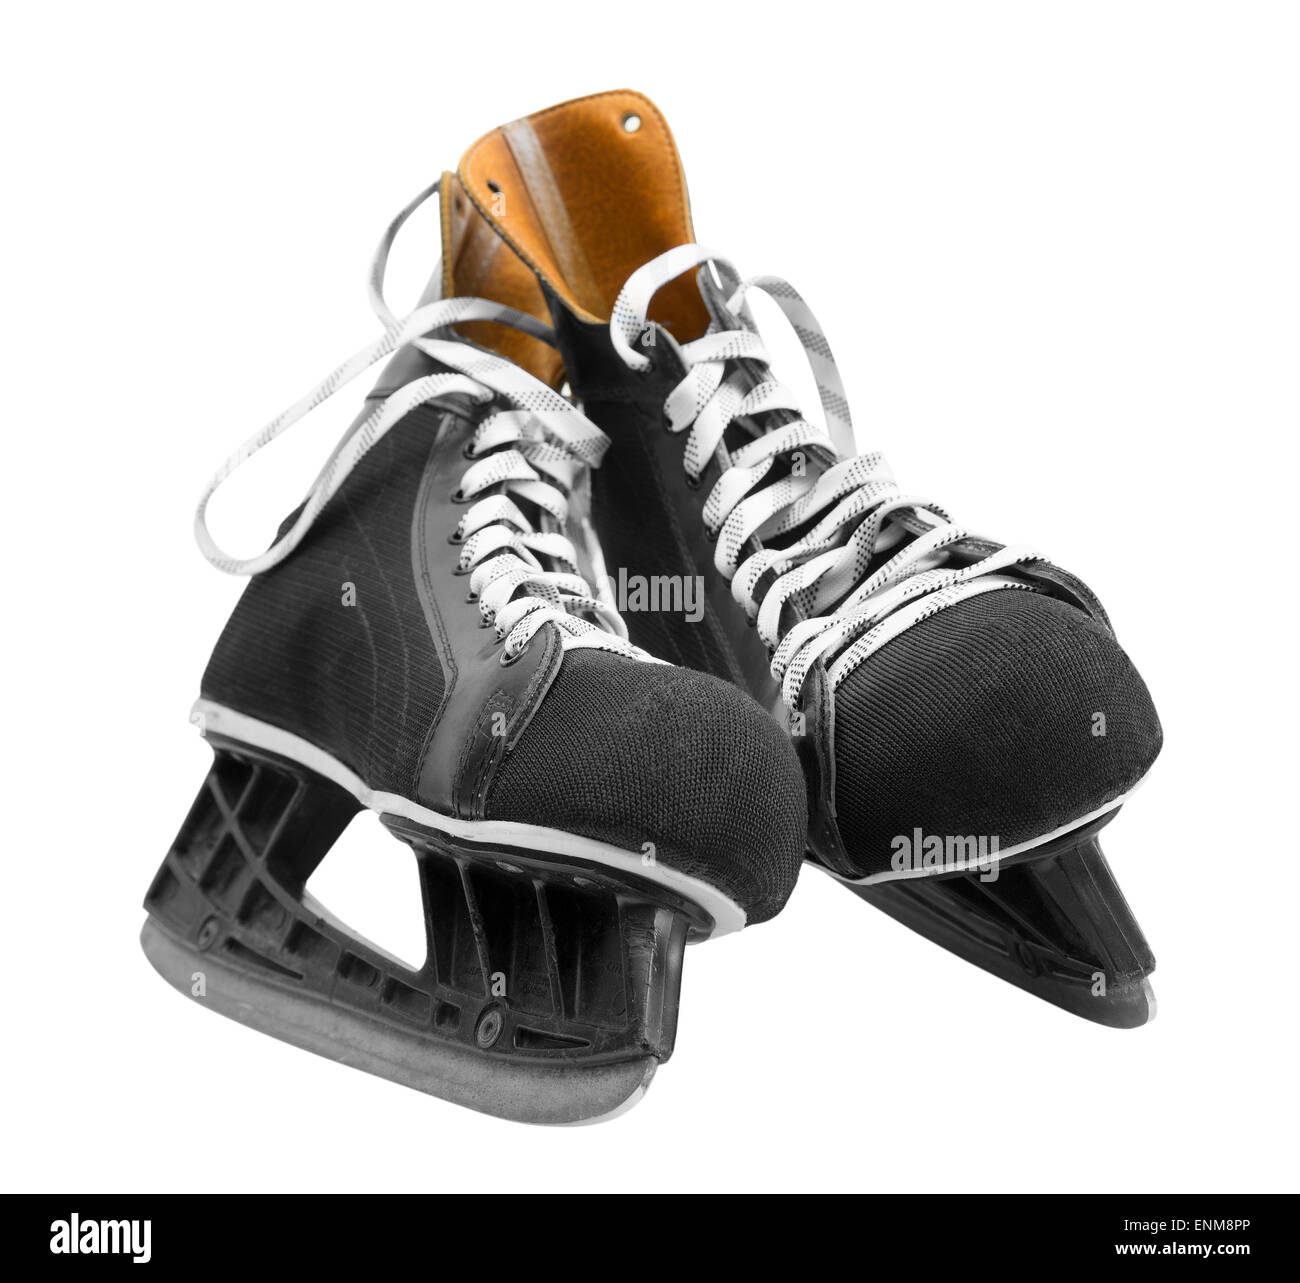 ice skate - Stock Image